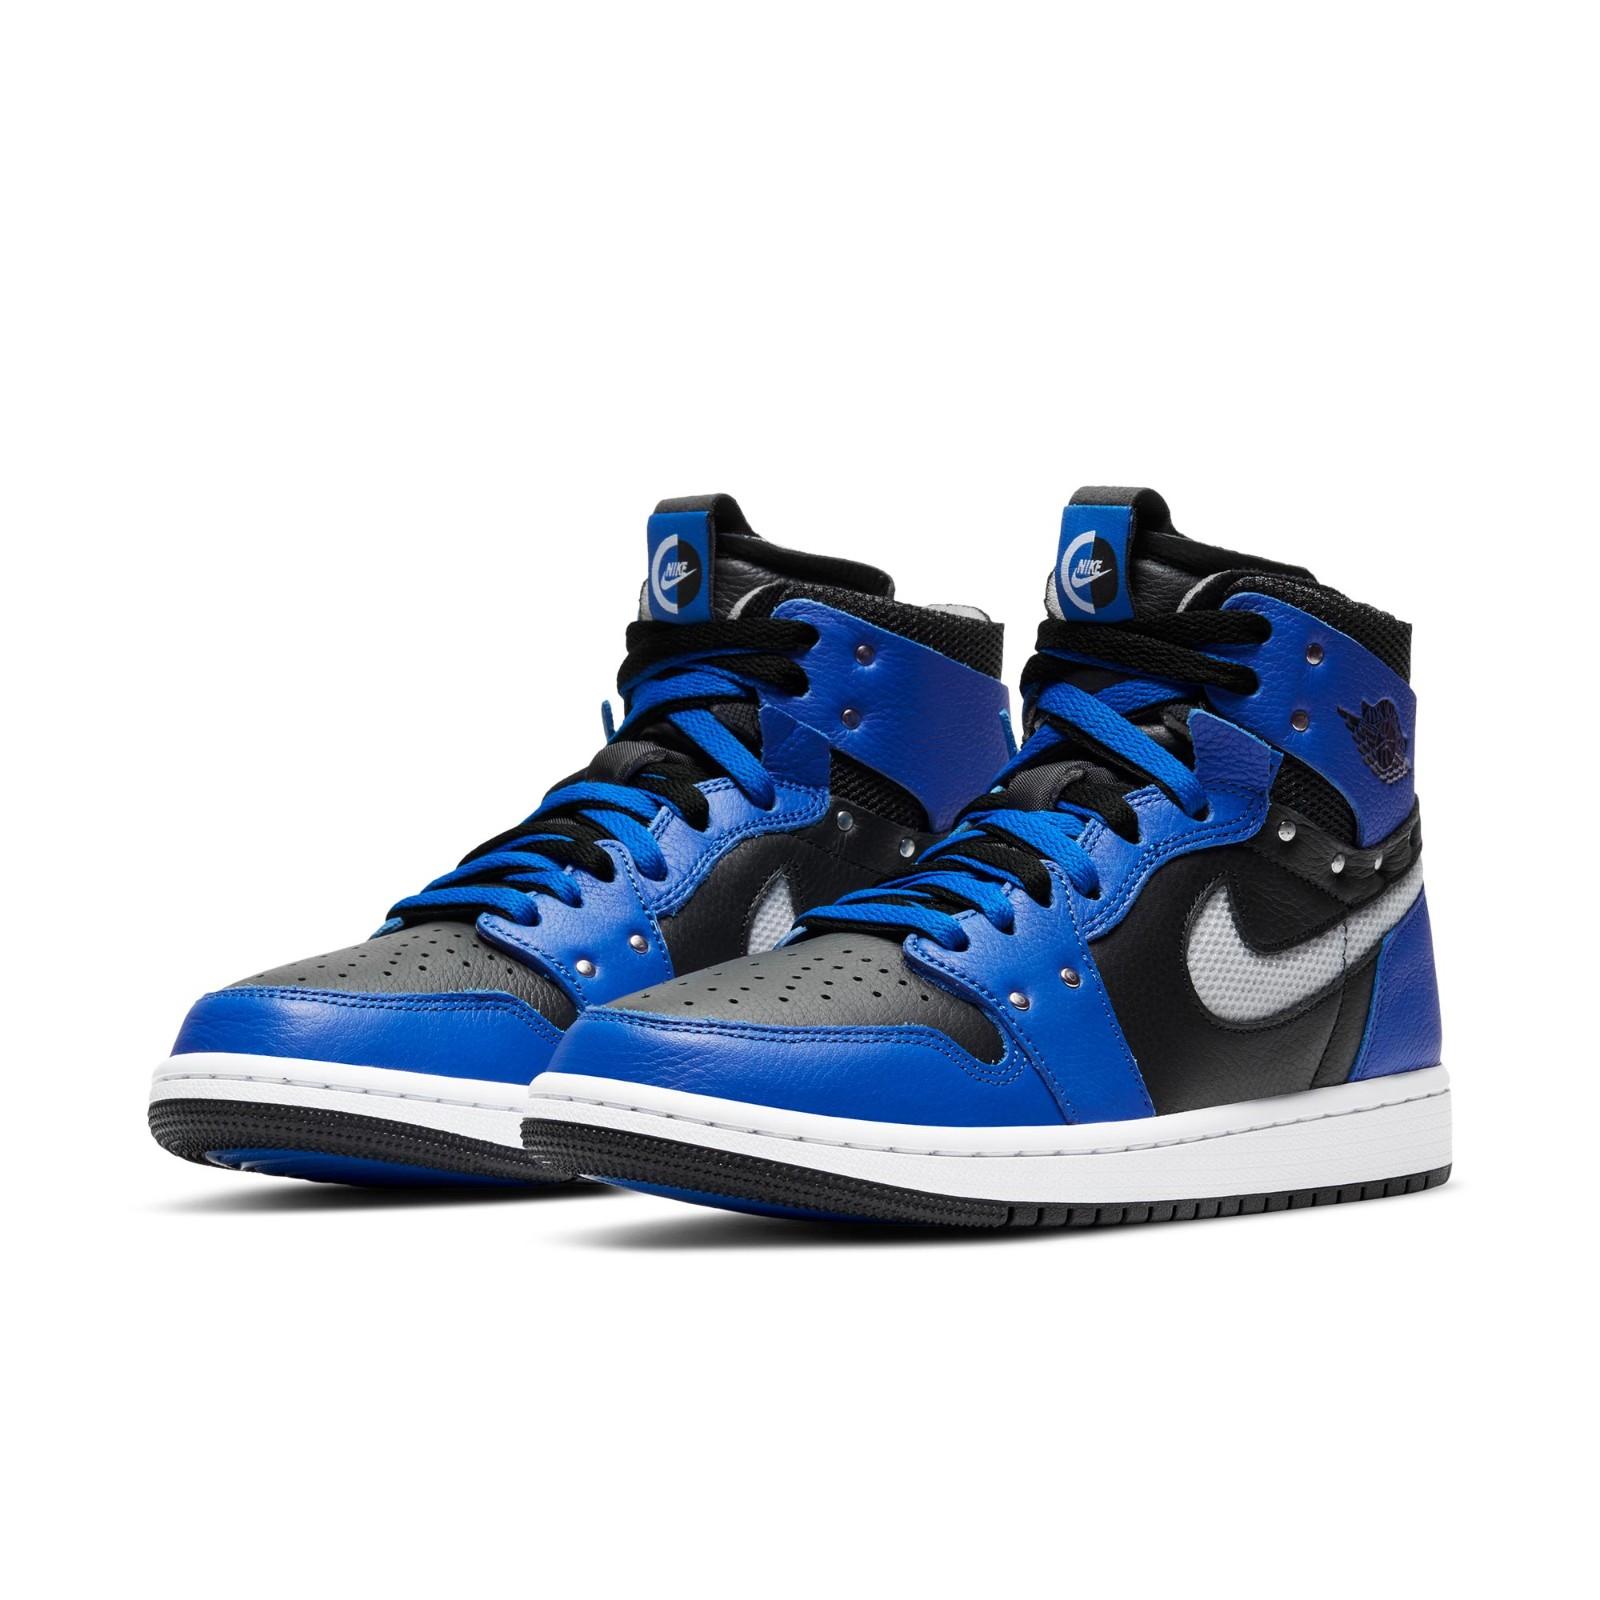 AIR JORDAN 正代系列 Air Jordan 1 女士篮球鞋 CZ1360-401 皇家蓝/黑/白色 35.5